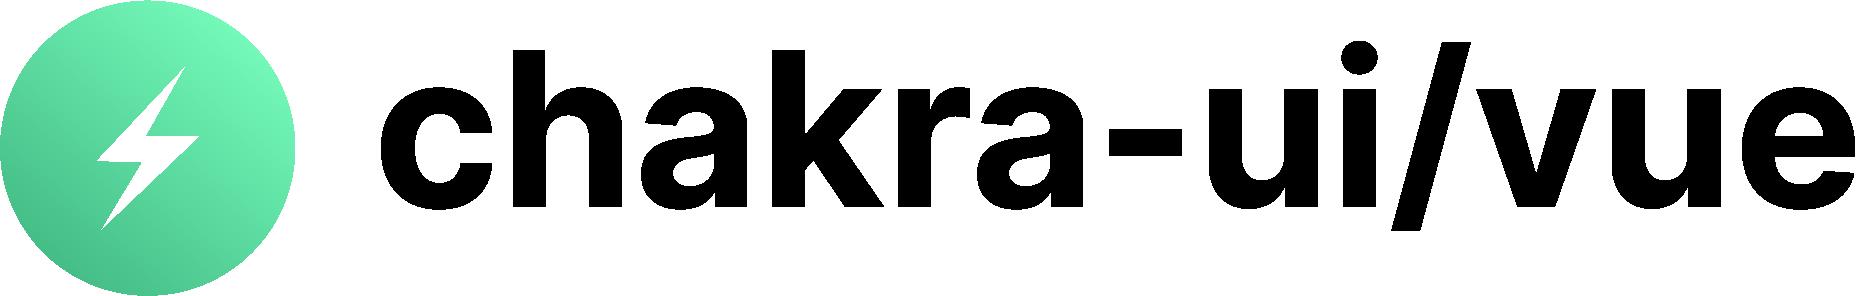 chakra-ui symbol